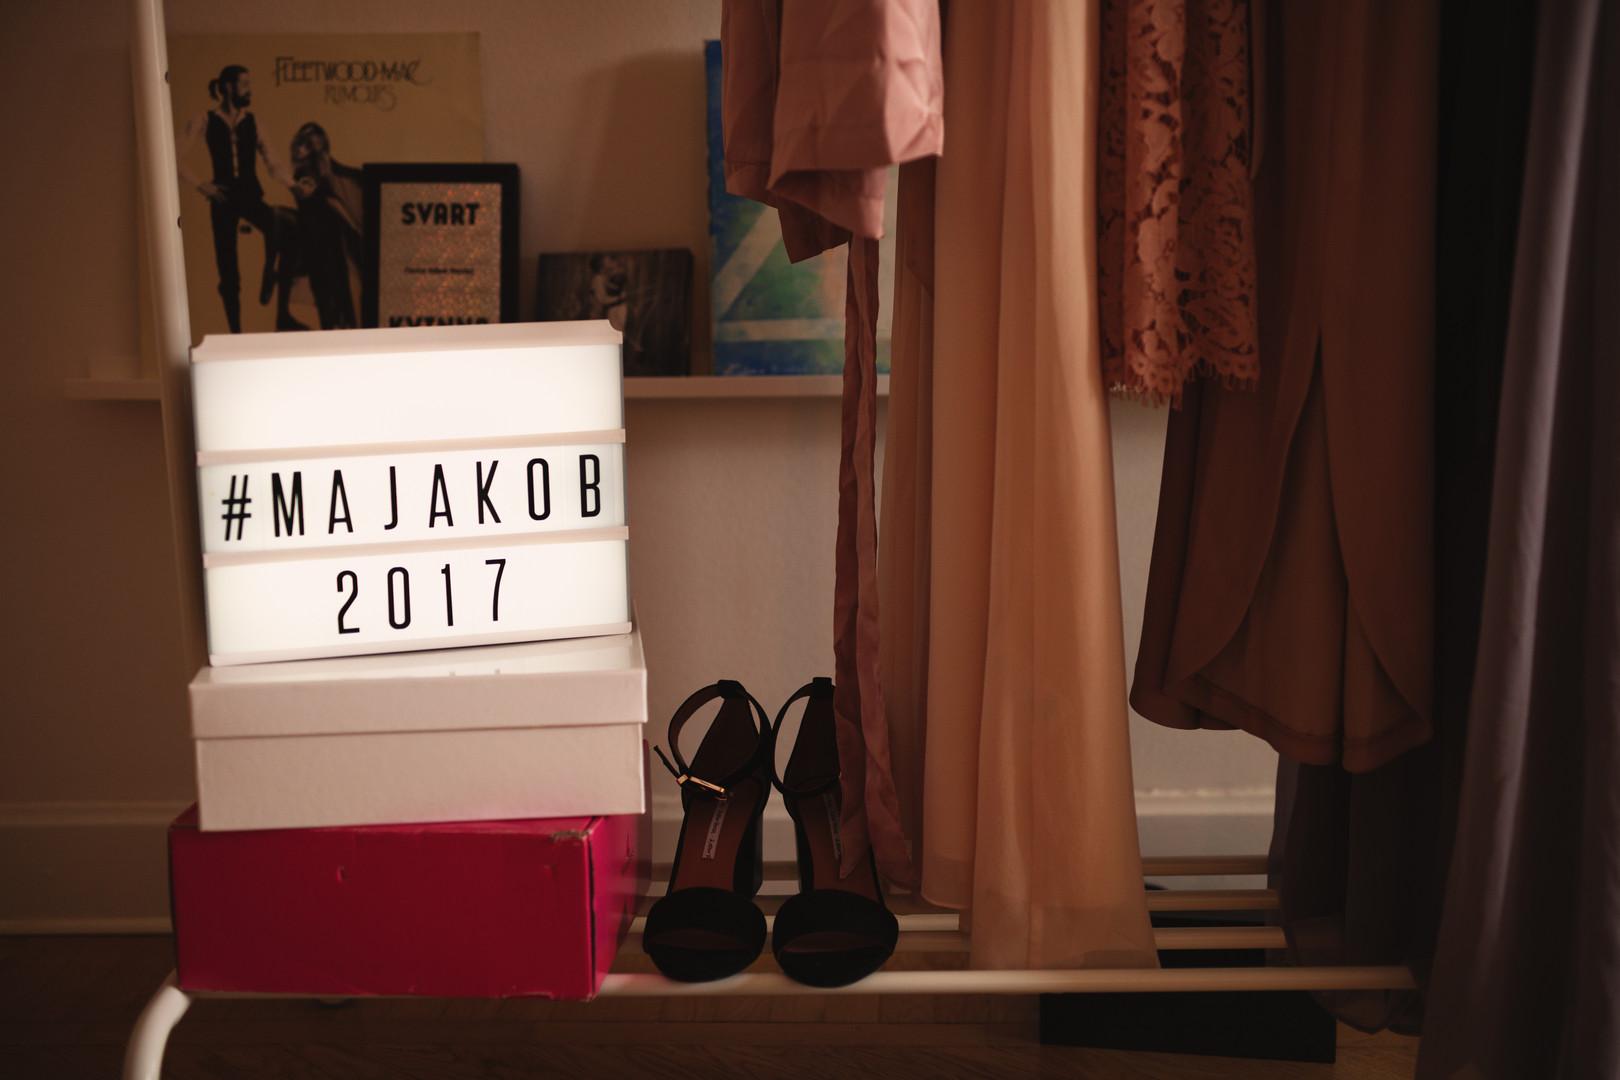 Majakob_001.jpg